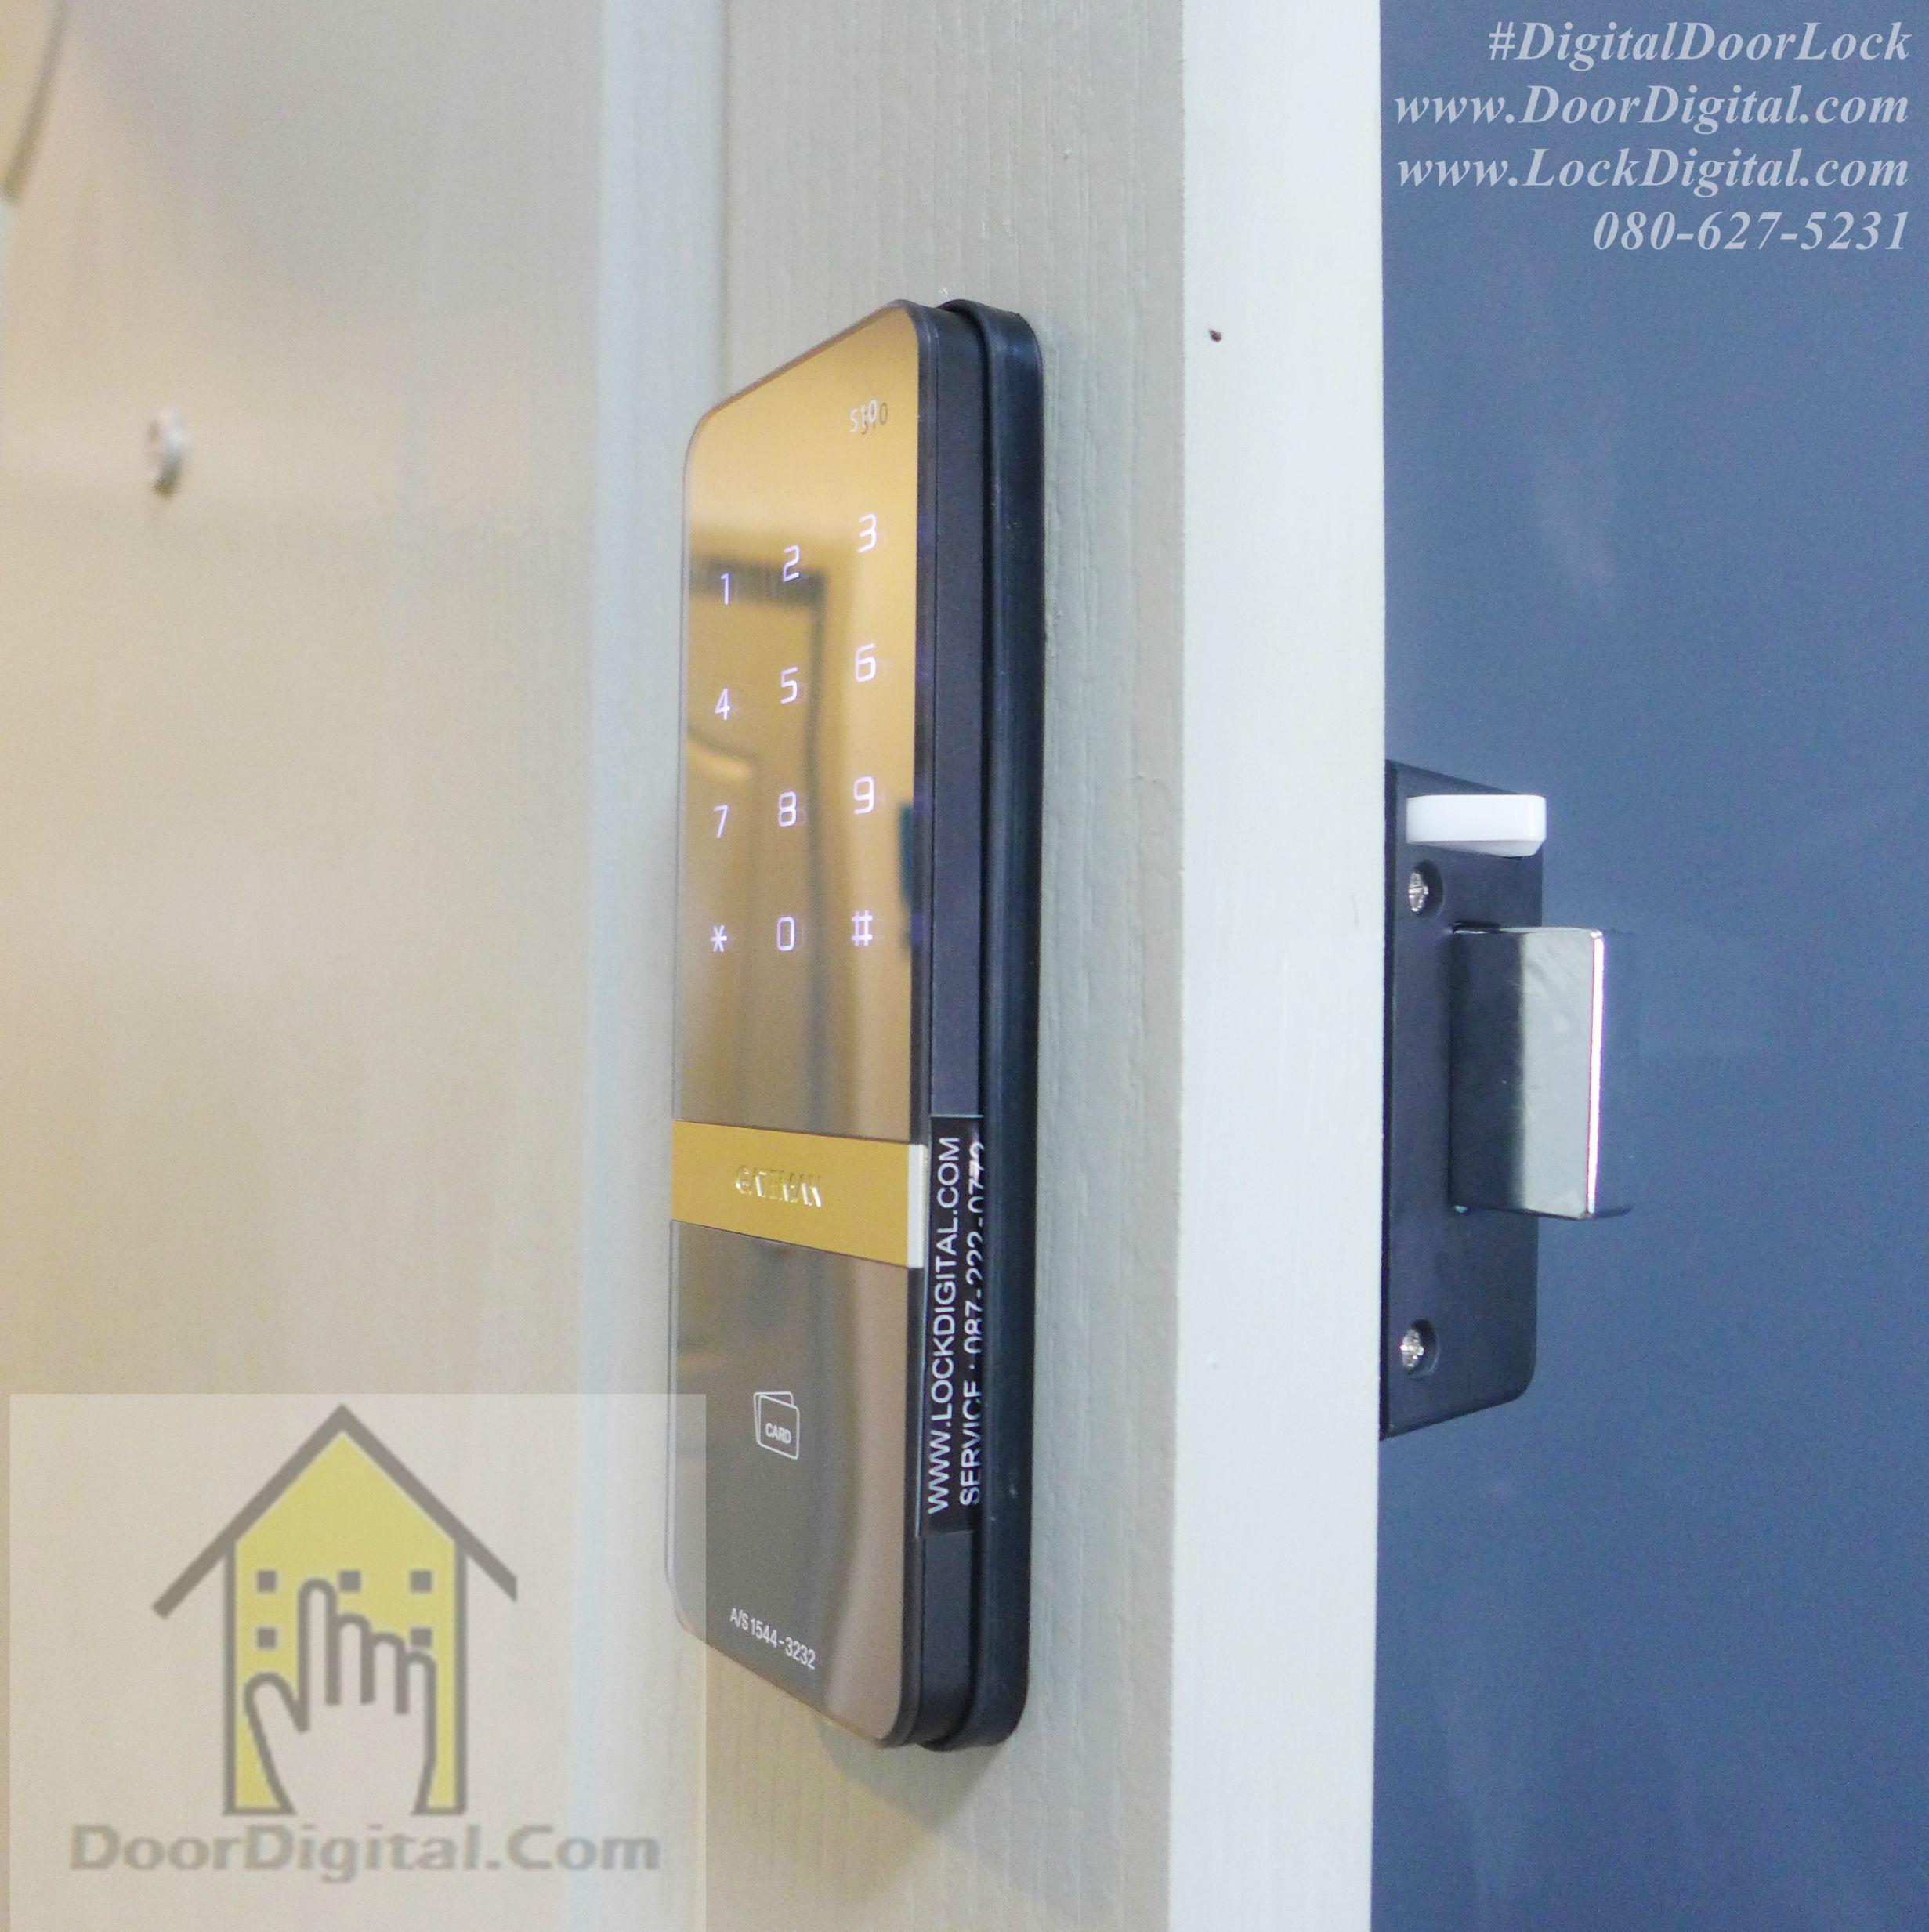 gateman digital door lock manual